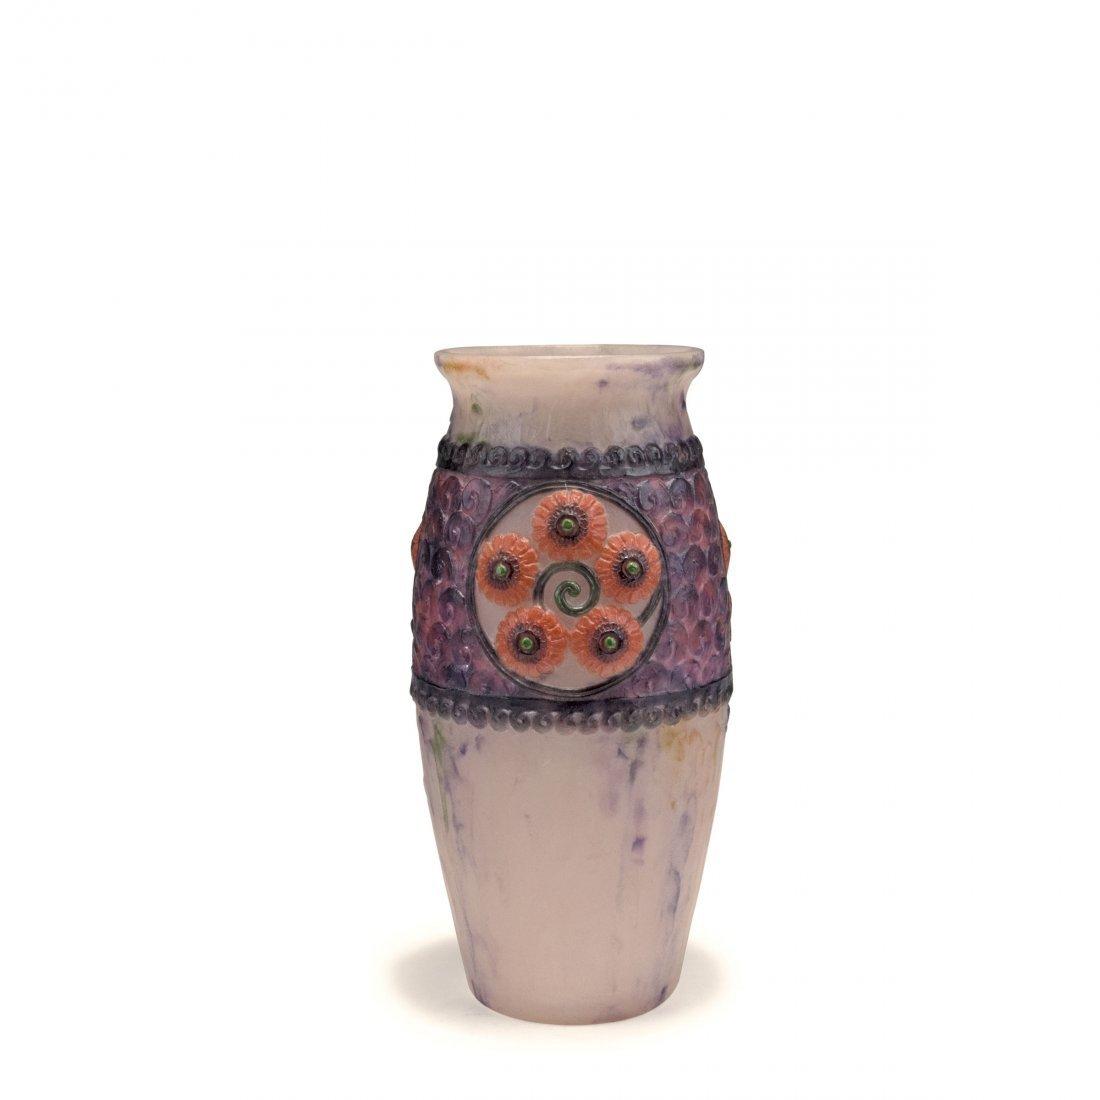 'Medaillons a fleurs' vase, 1919